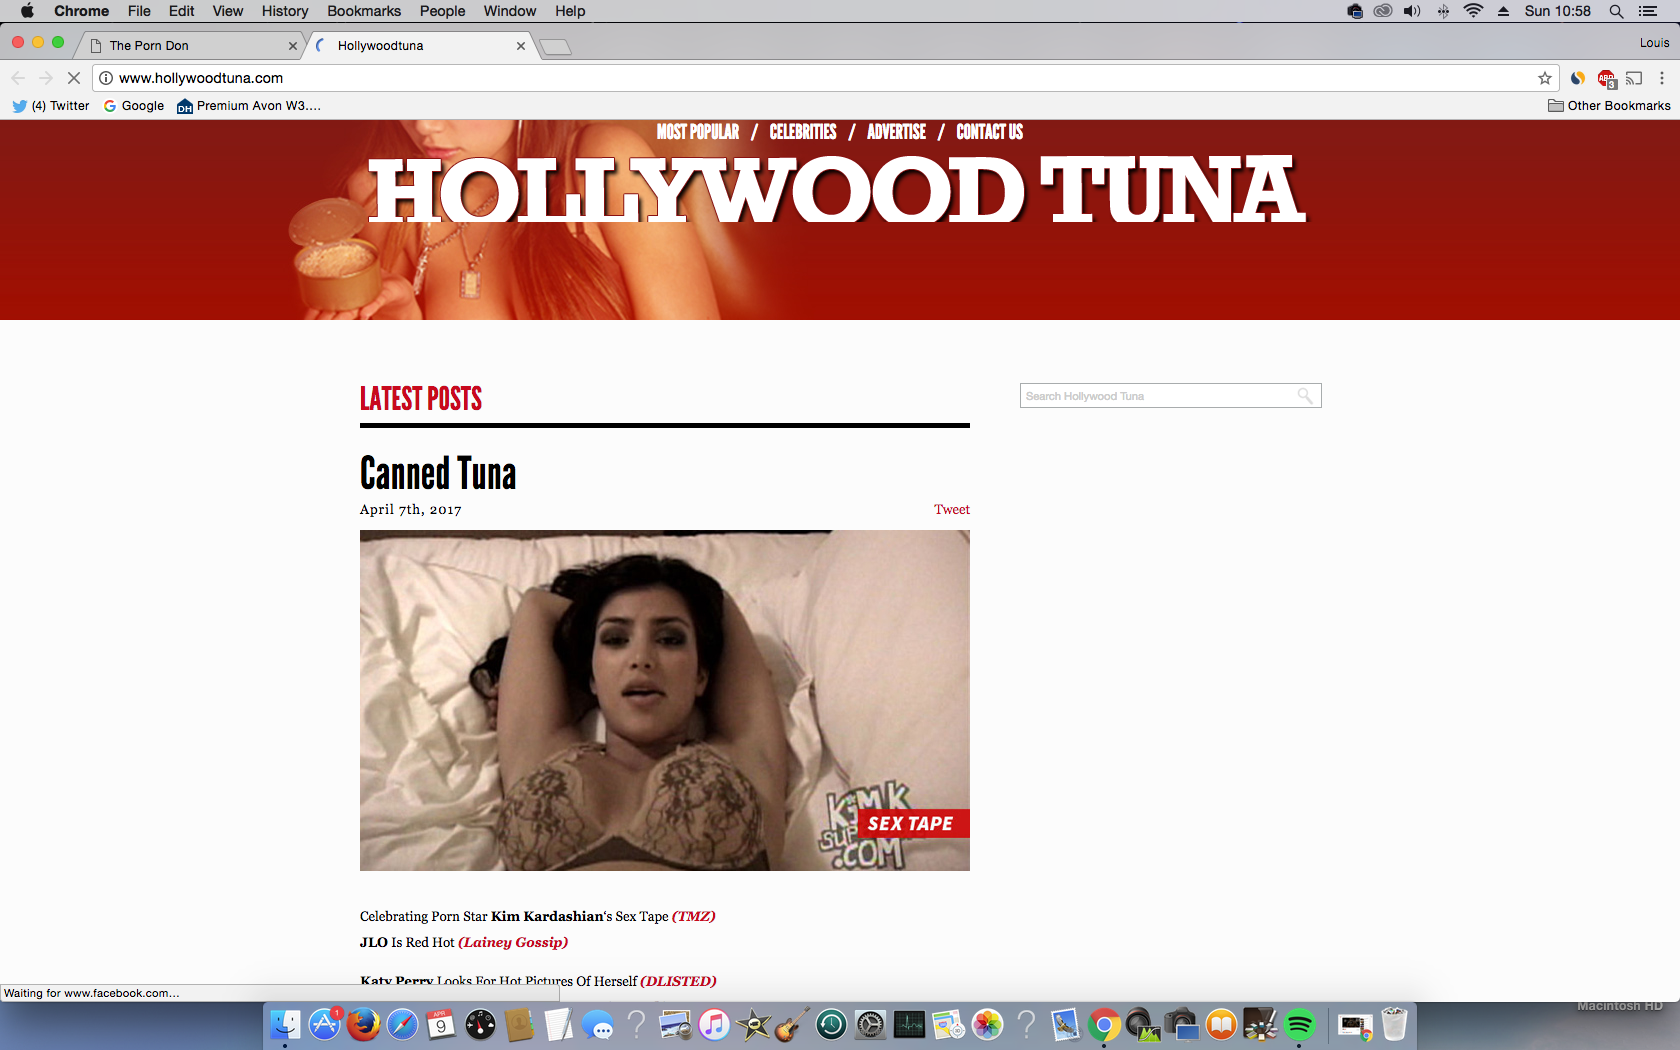 HollywoodTuna